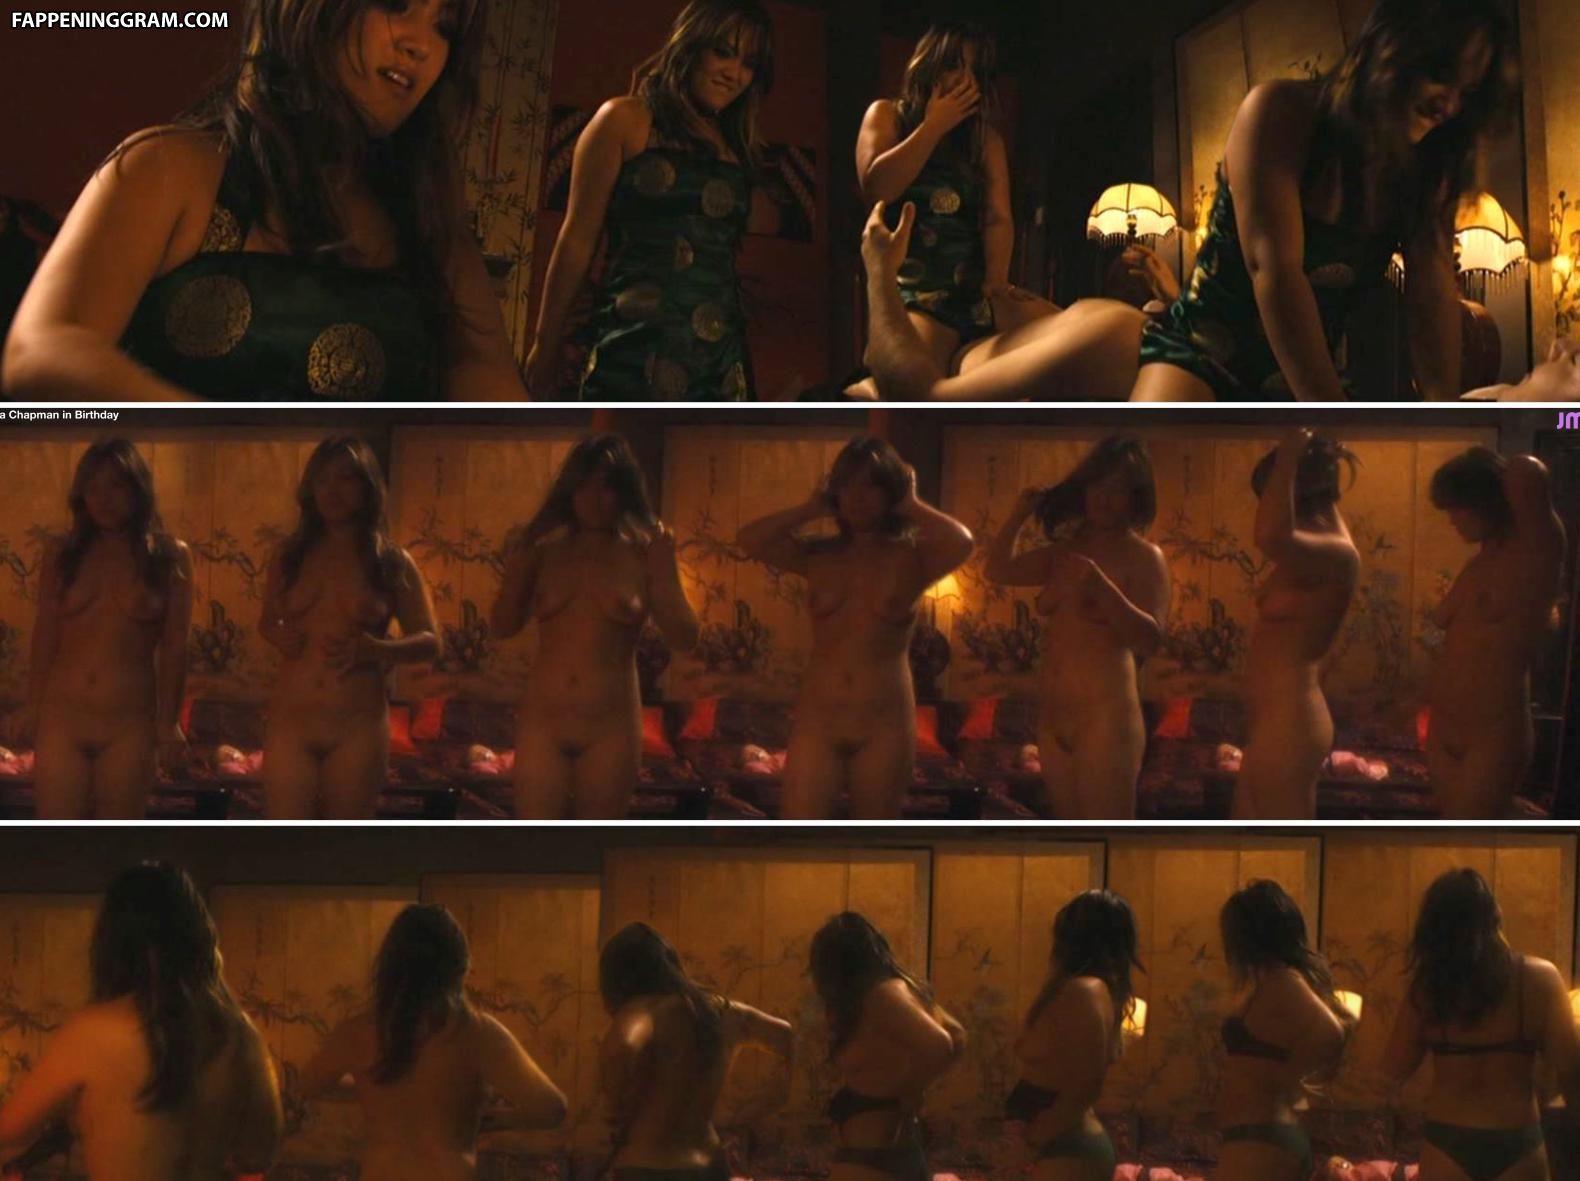 Daphne Klyde Set Snsd Blowjob Pics Ghana Hairy Porn Free Pics